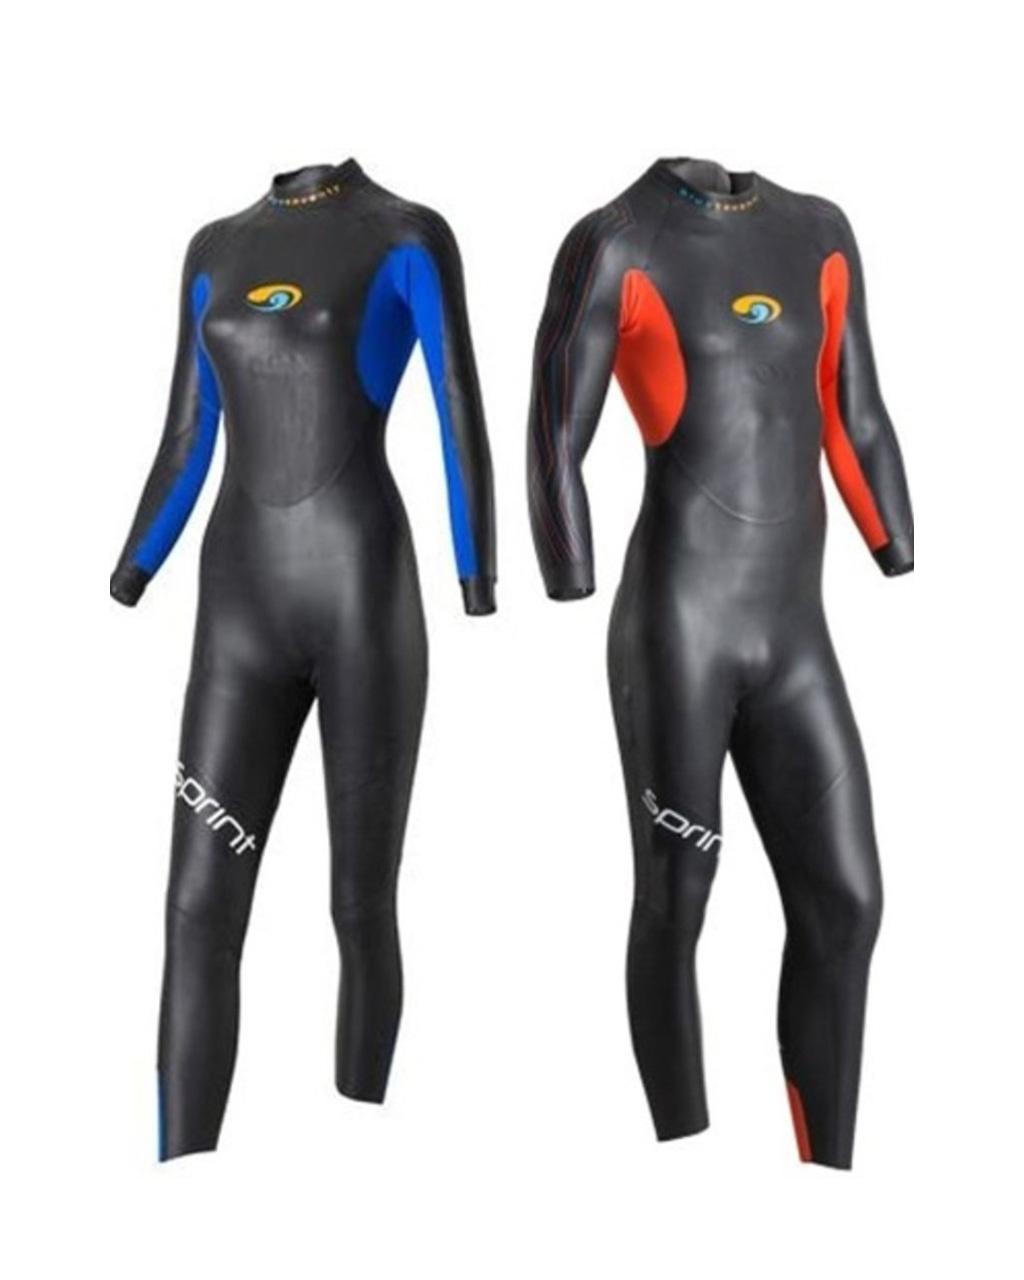 Tri It Multisport Rental Wetsuit (Sept - April) - 1 week